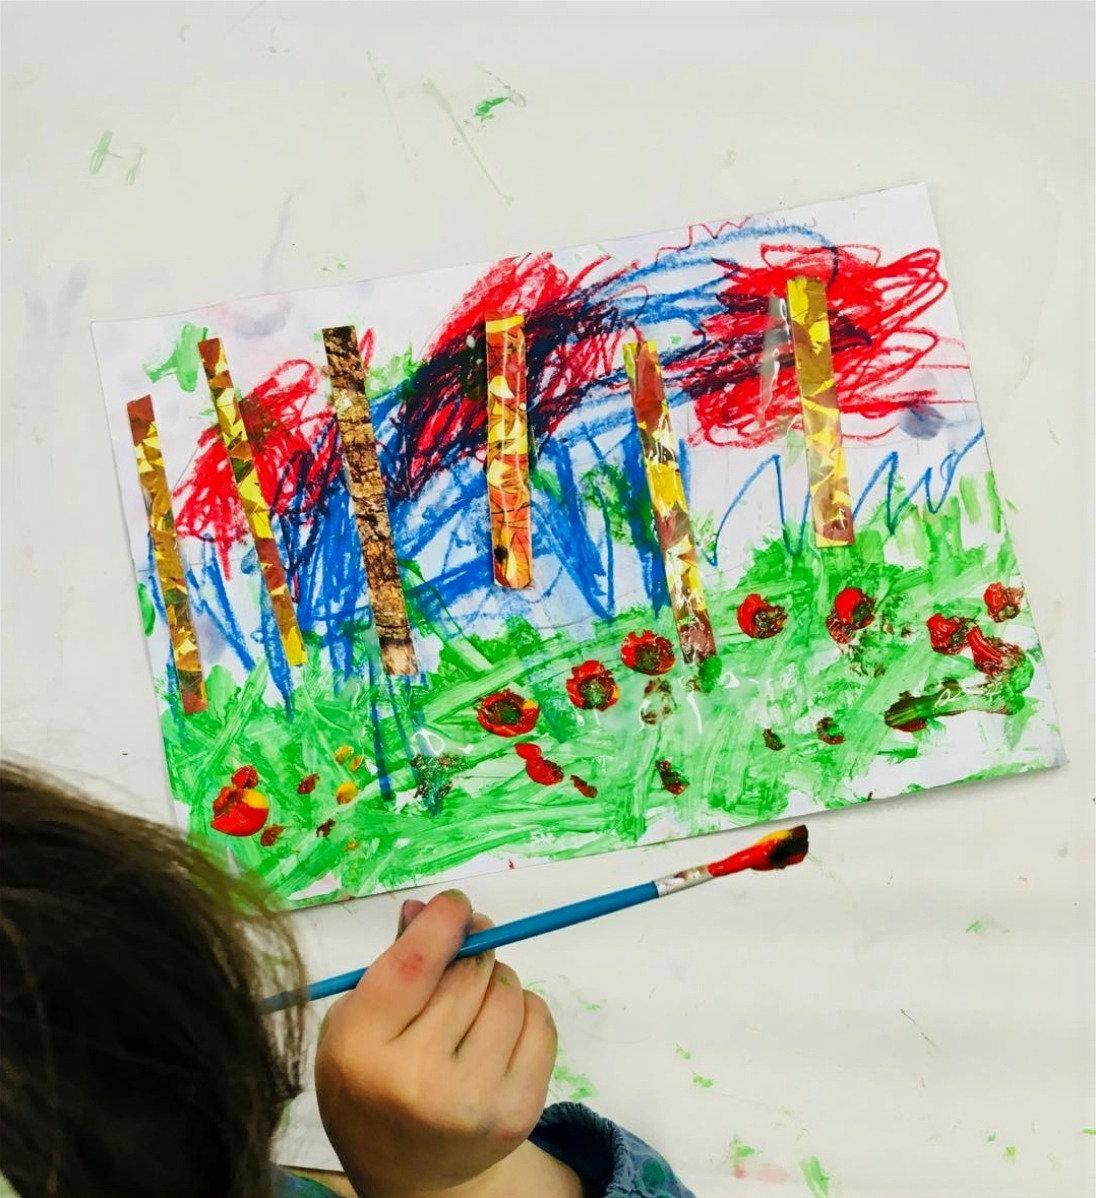 Thursday PM Pre-school Messy Art Class